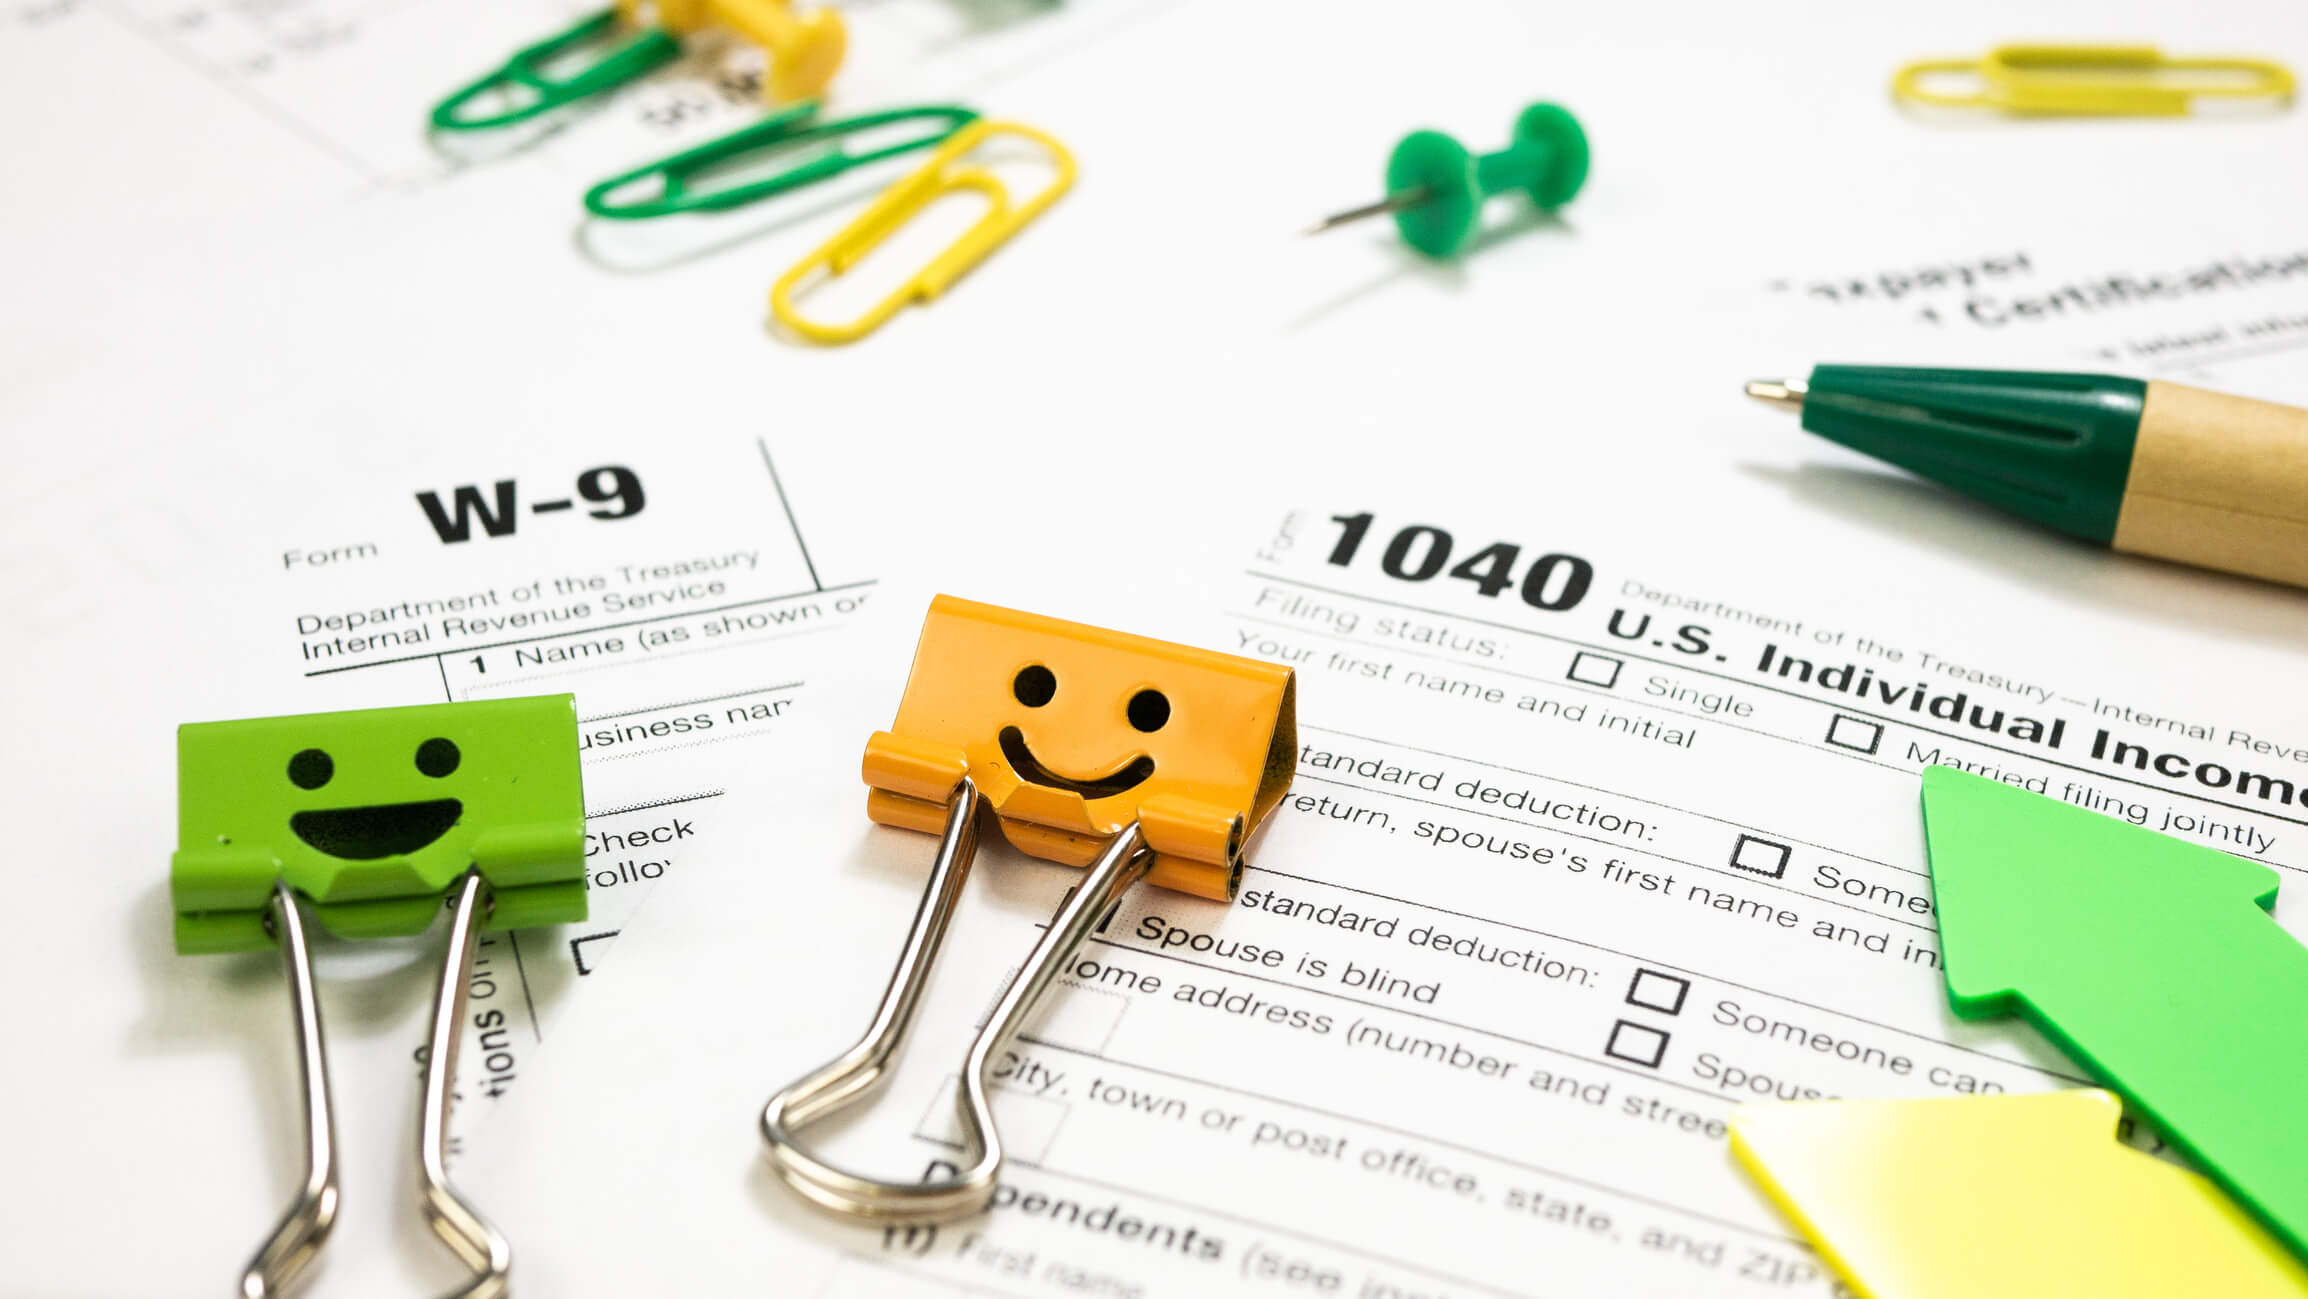 Audit Exempt - Complete Controller